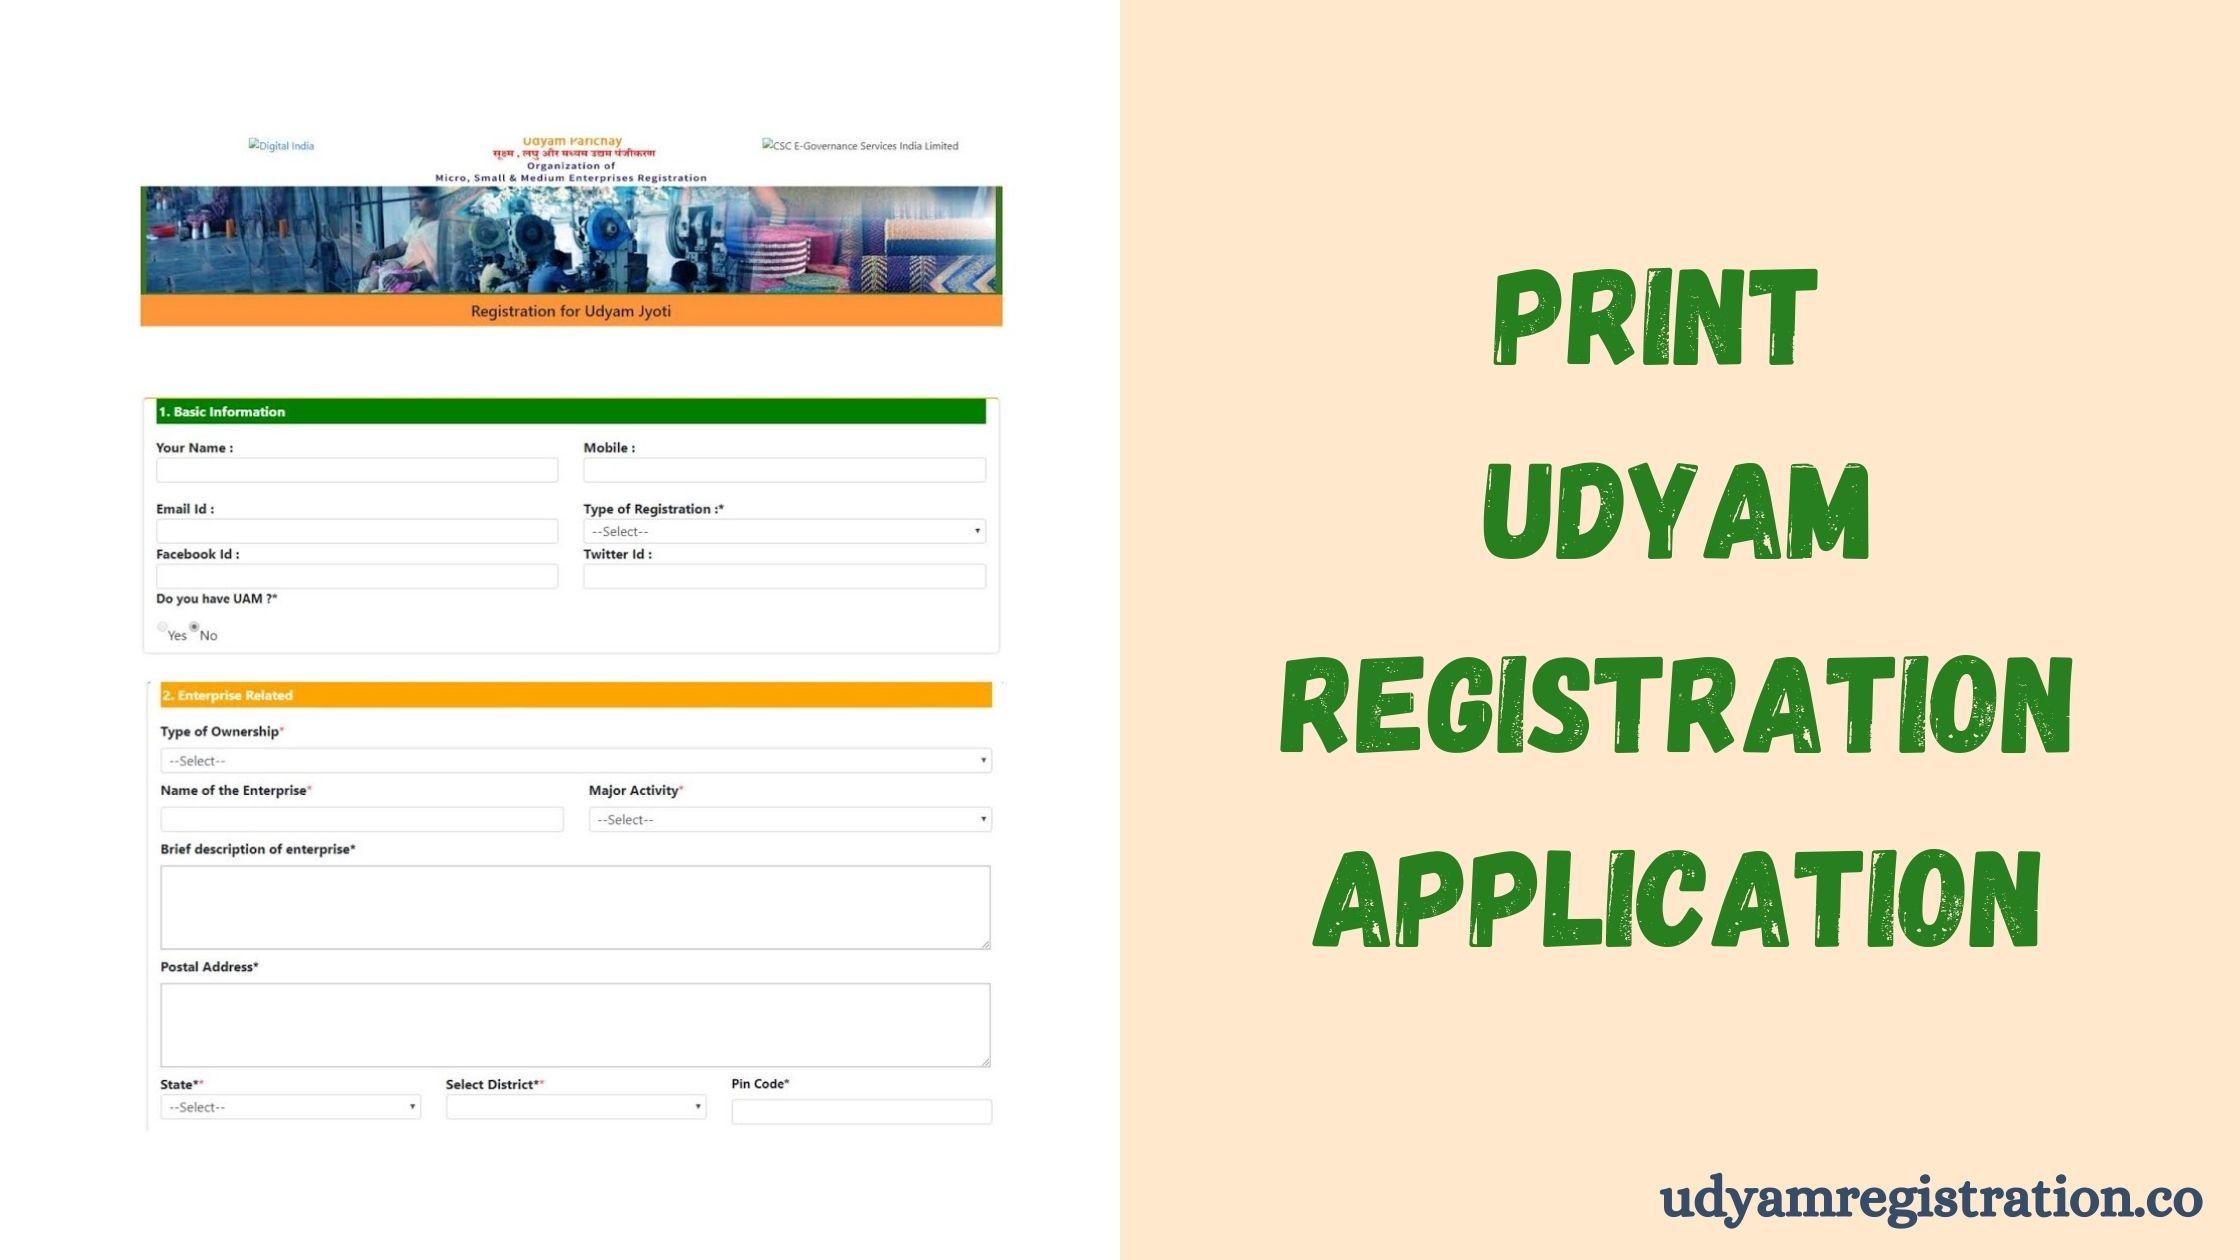 udyamregistration